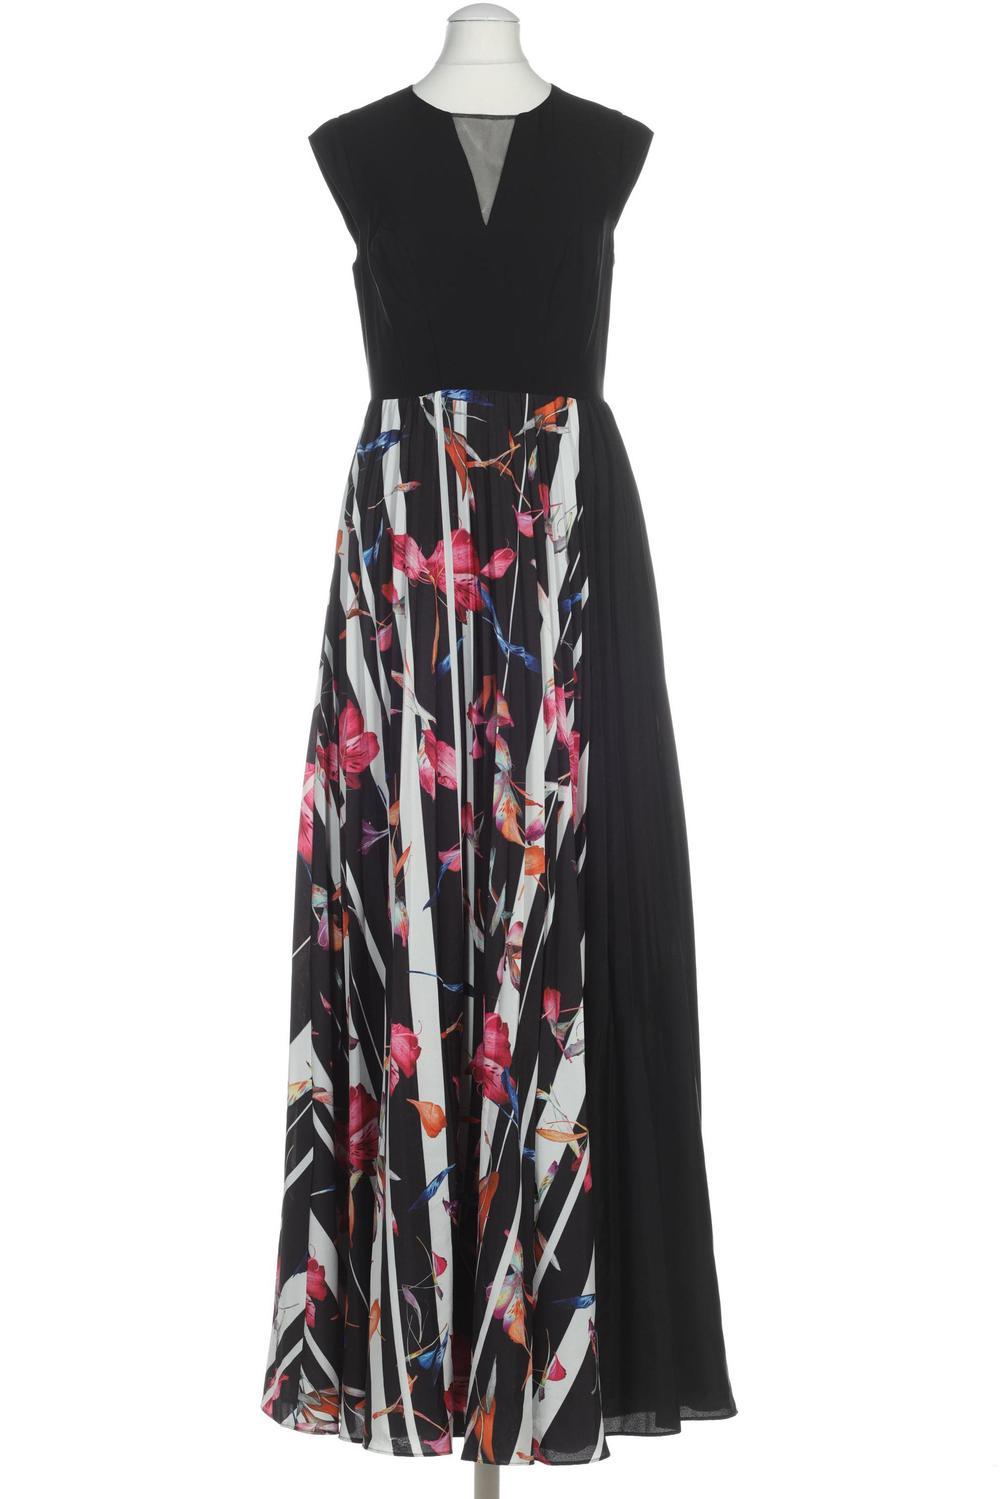 Details zu COAST Kleid Damen Dress Damenkleid Gr. DE 20 mehrfarbig, schwarz  #c20d72020